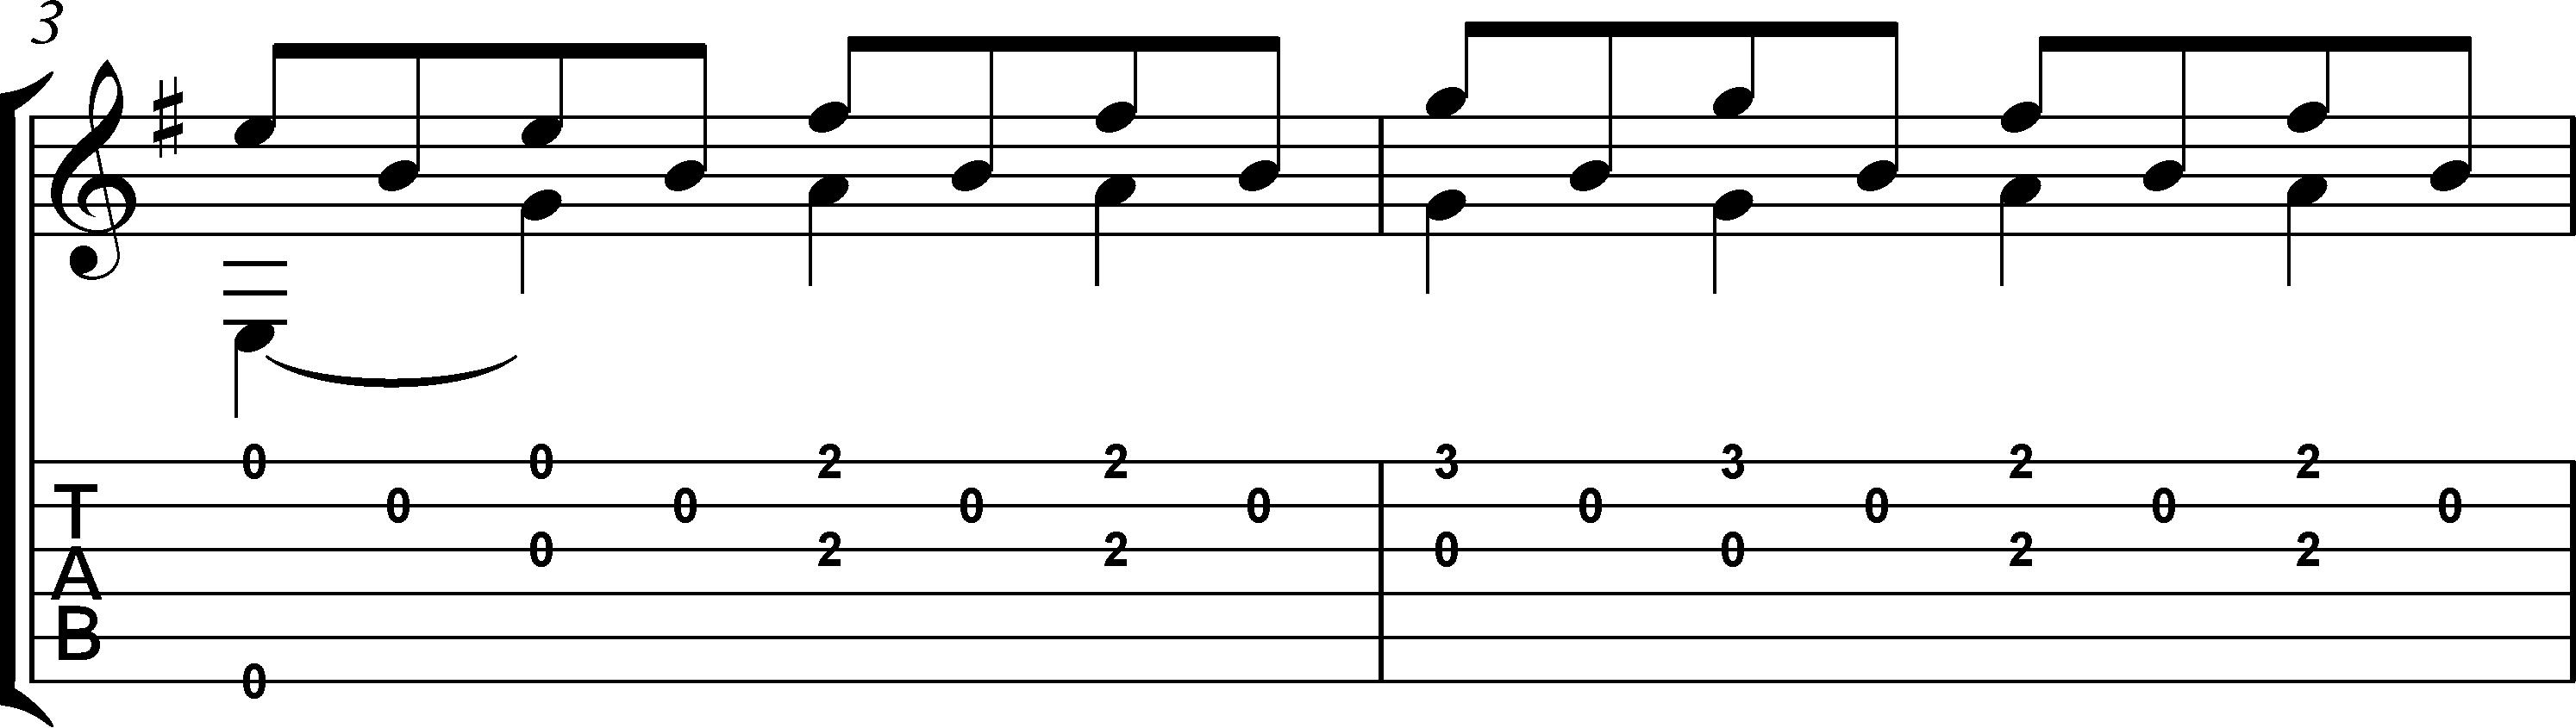 Andandino para guitarra partitura + tablatura 2